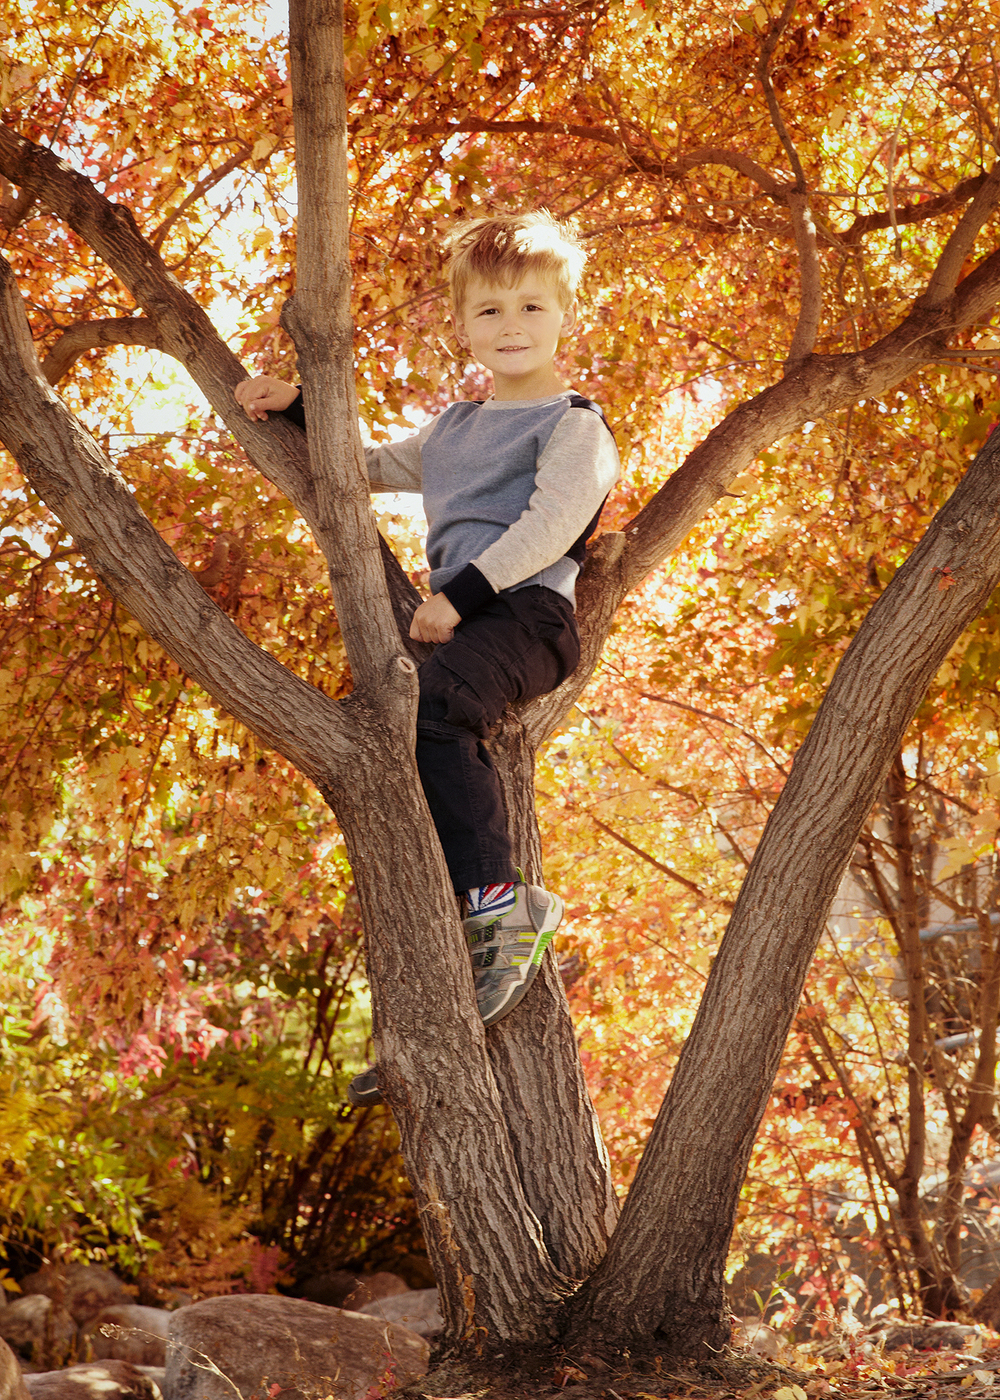 professional-portrait-children-photographer-saskatoon-cindy-moleski-28213 3092 Culenaire.jpg